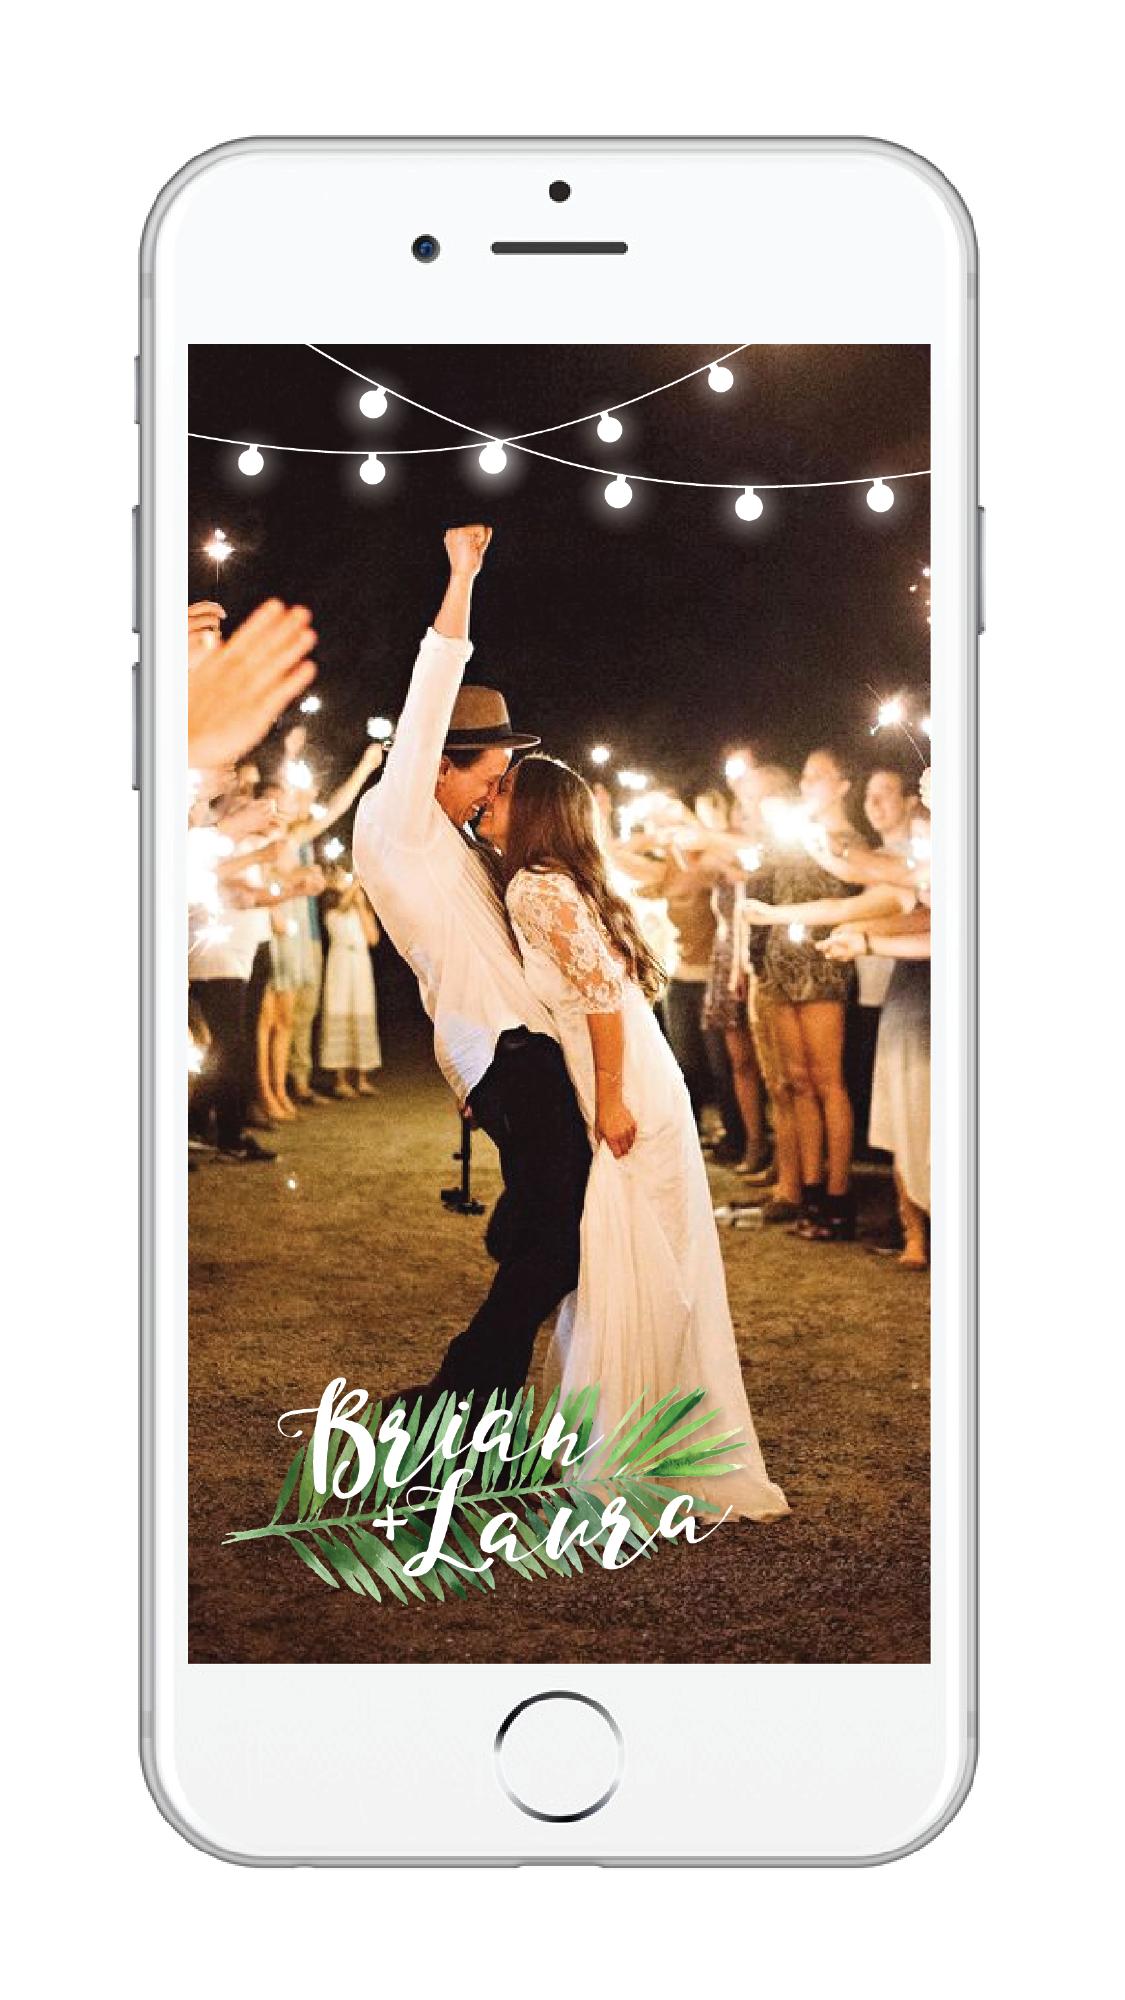 Custom Wedding Snapchat Geofilter Wedding Snapchat Filter Snapchat Geofilters Snapchat Geofilters Wedding